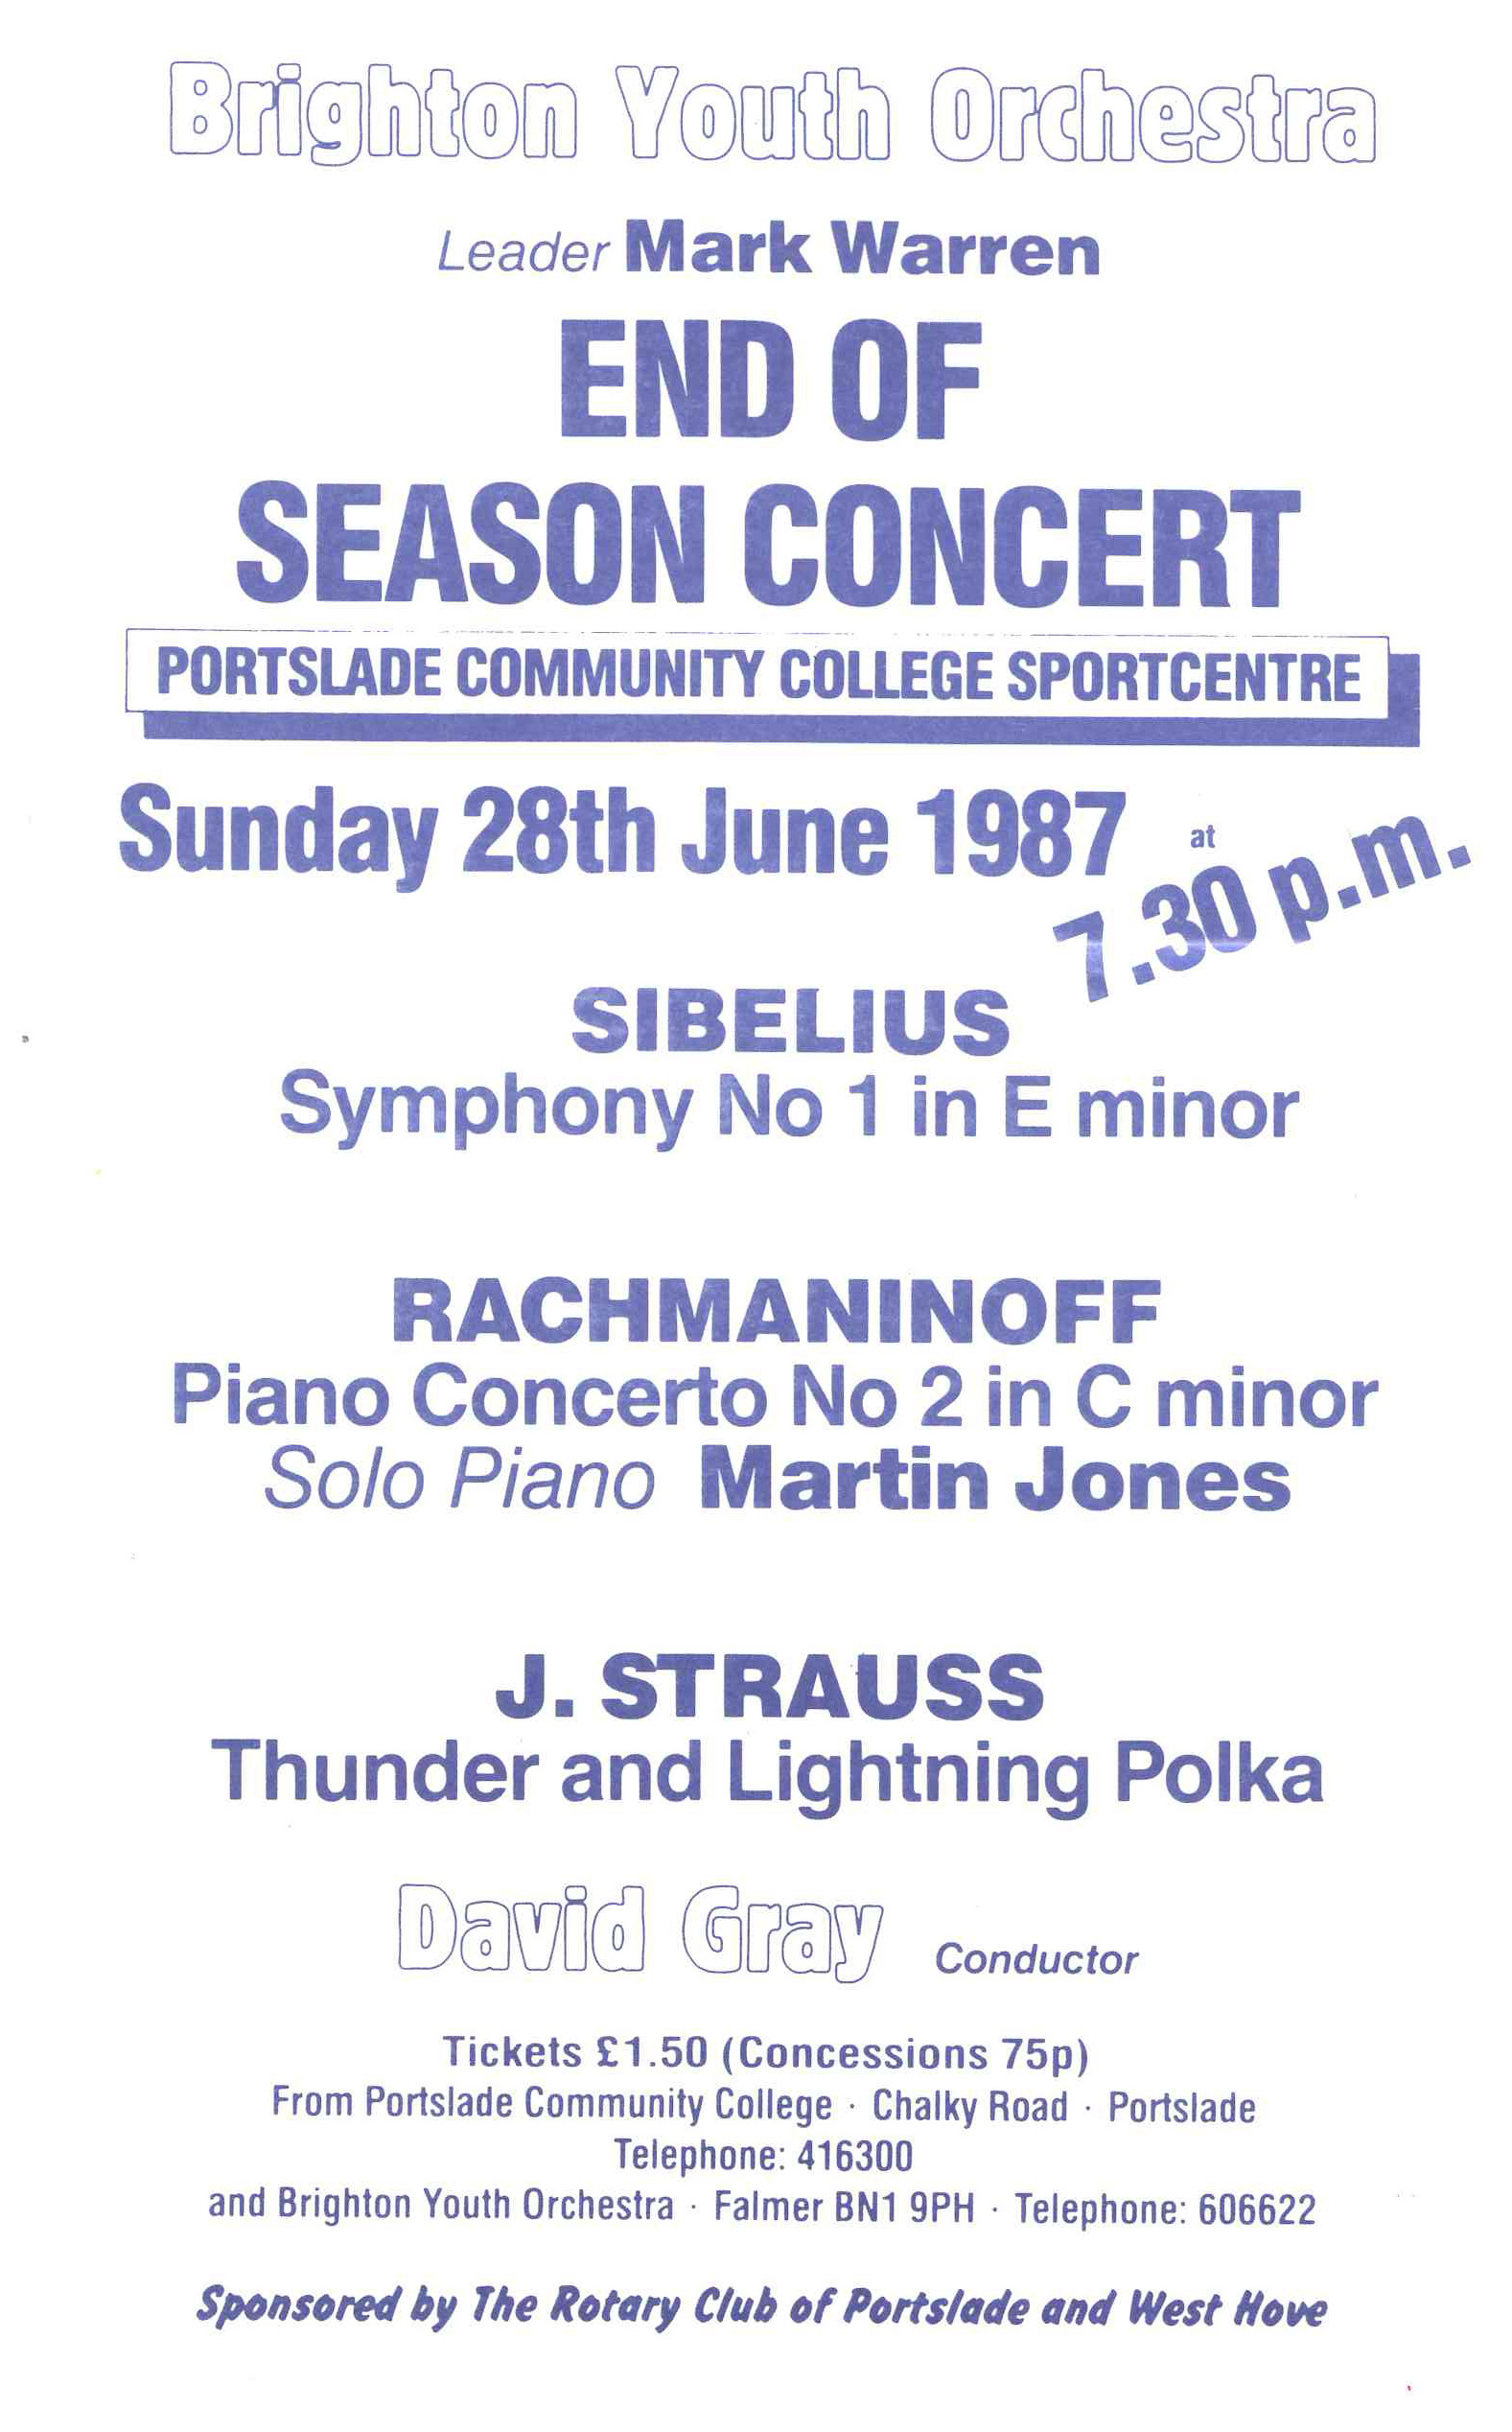 00177-BYO PCC Sportcenter, 28th June 1987.jpg